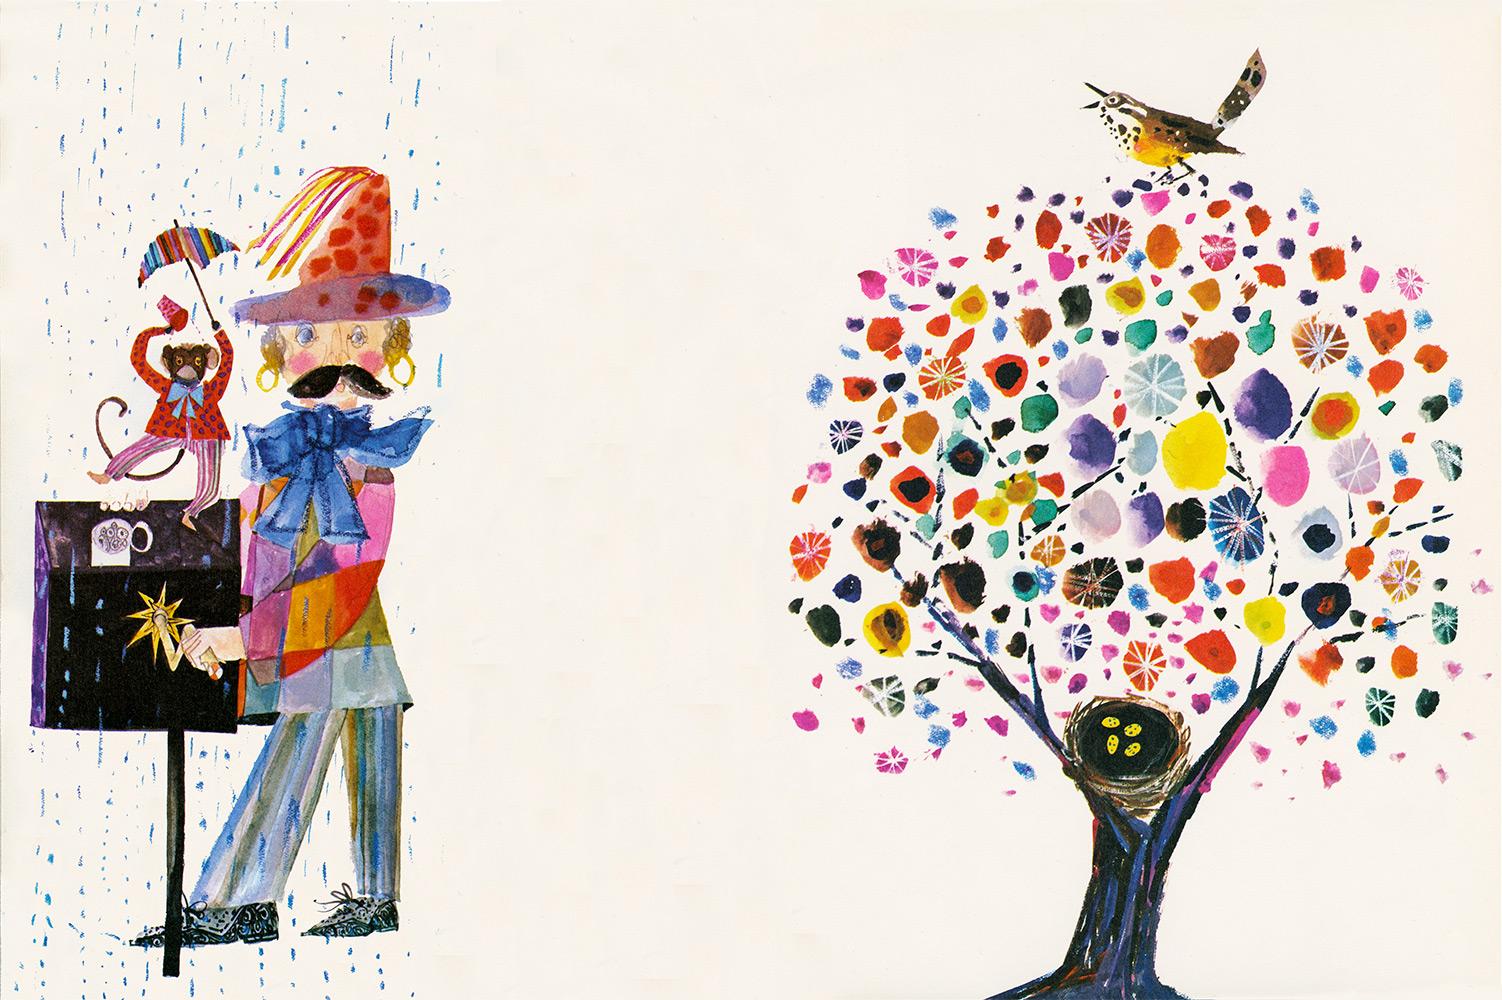 Robert-Louis-Stevenson-a-childs-garden-of-verses-Singing-Brian-Wildsmith.jpg